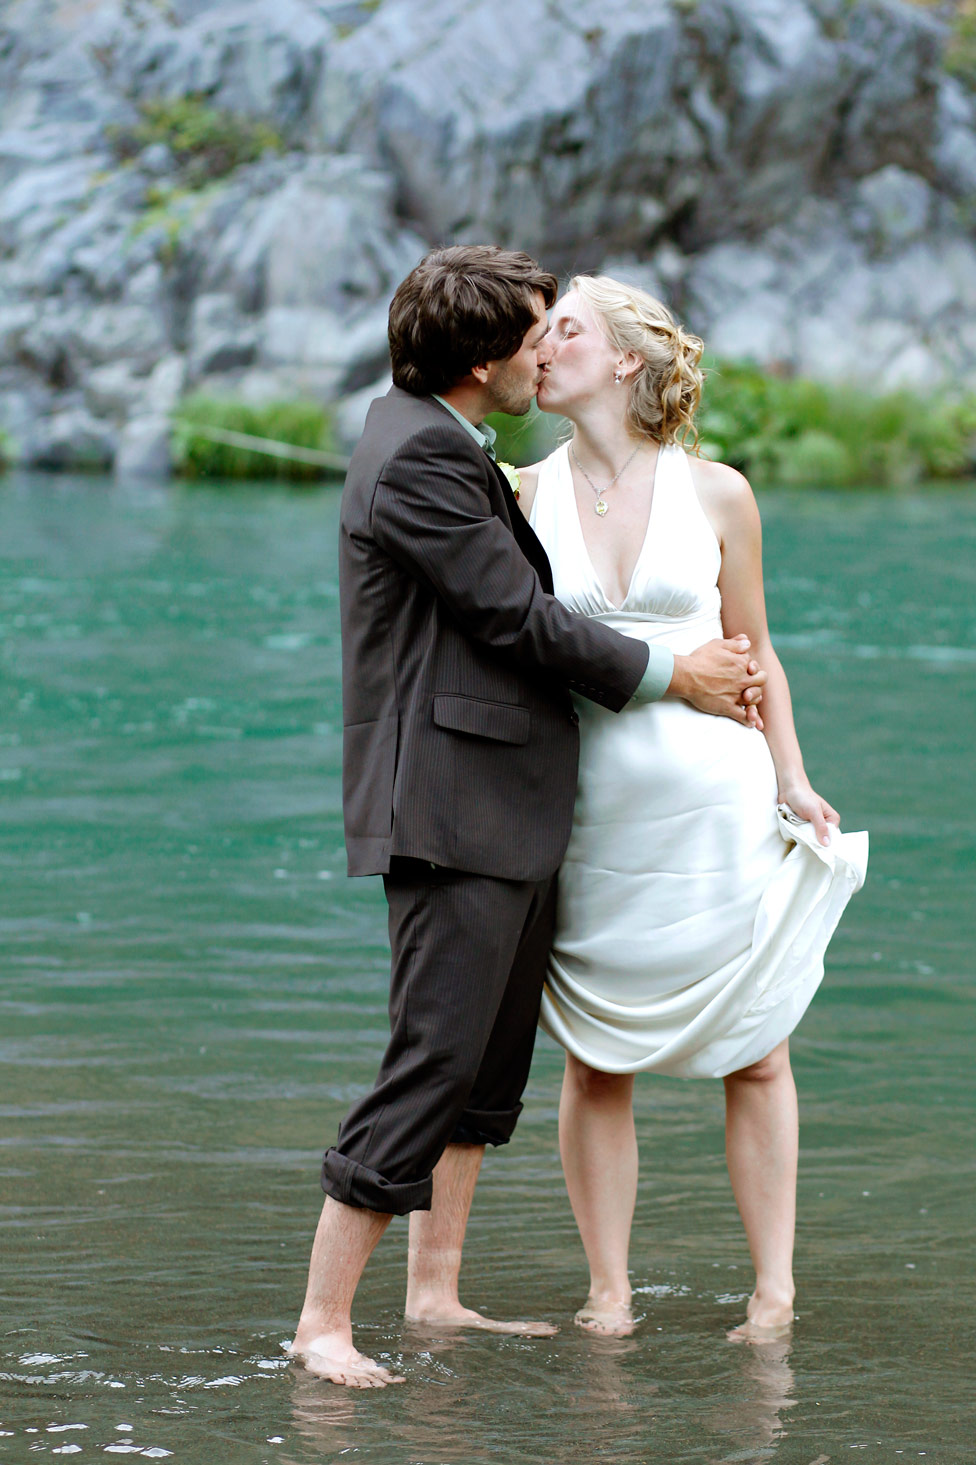 rustic-outdoor-trinity-river-wedding-ruthie-hauge-photography-41.jpg